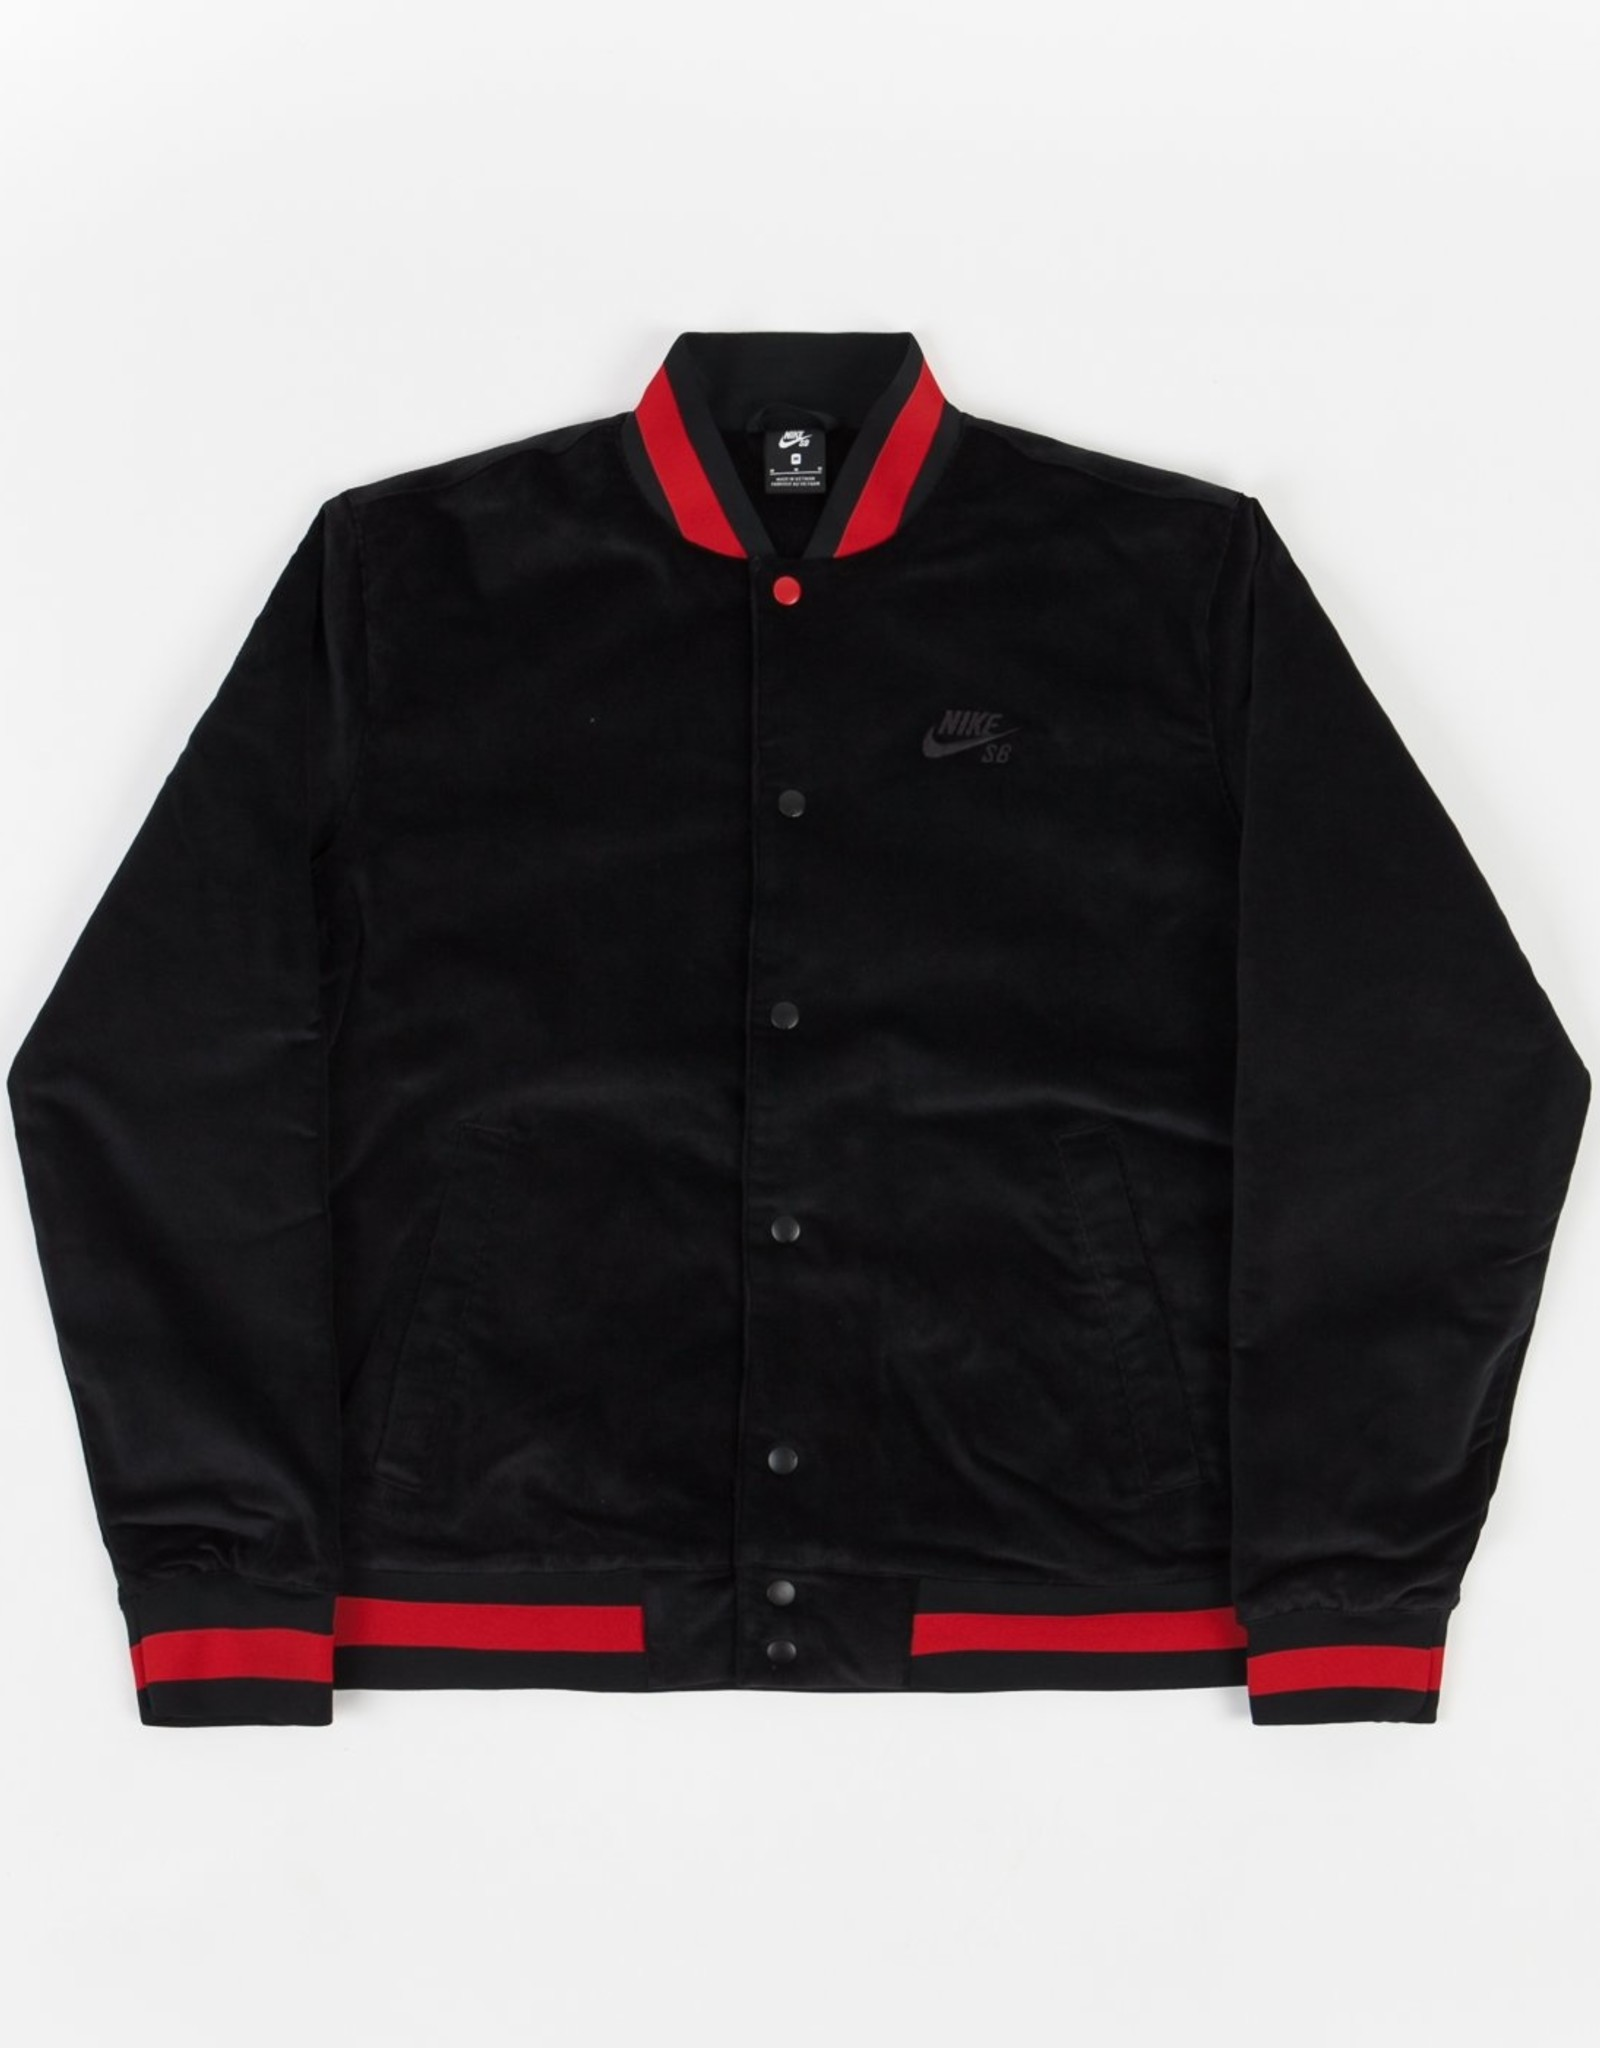 NIKE NIKE SB CORDUROY SKATE BOMBER JACKET -  BLACK/BLACK/UNIVERSITY RED/BLACK